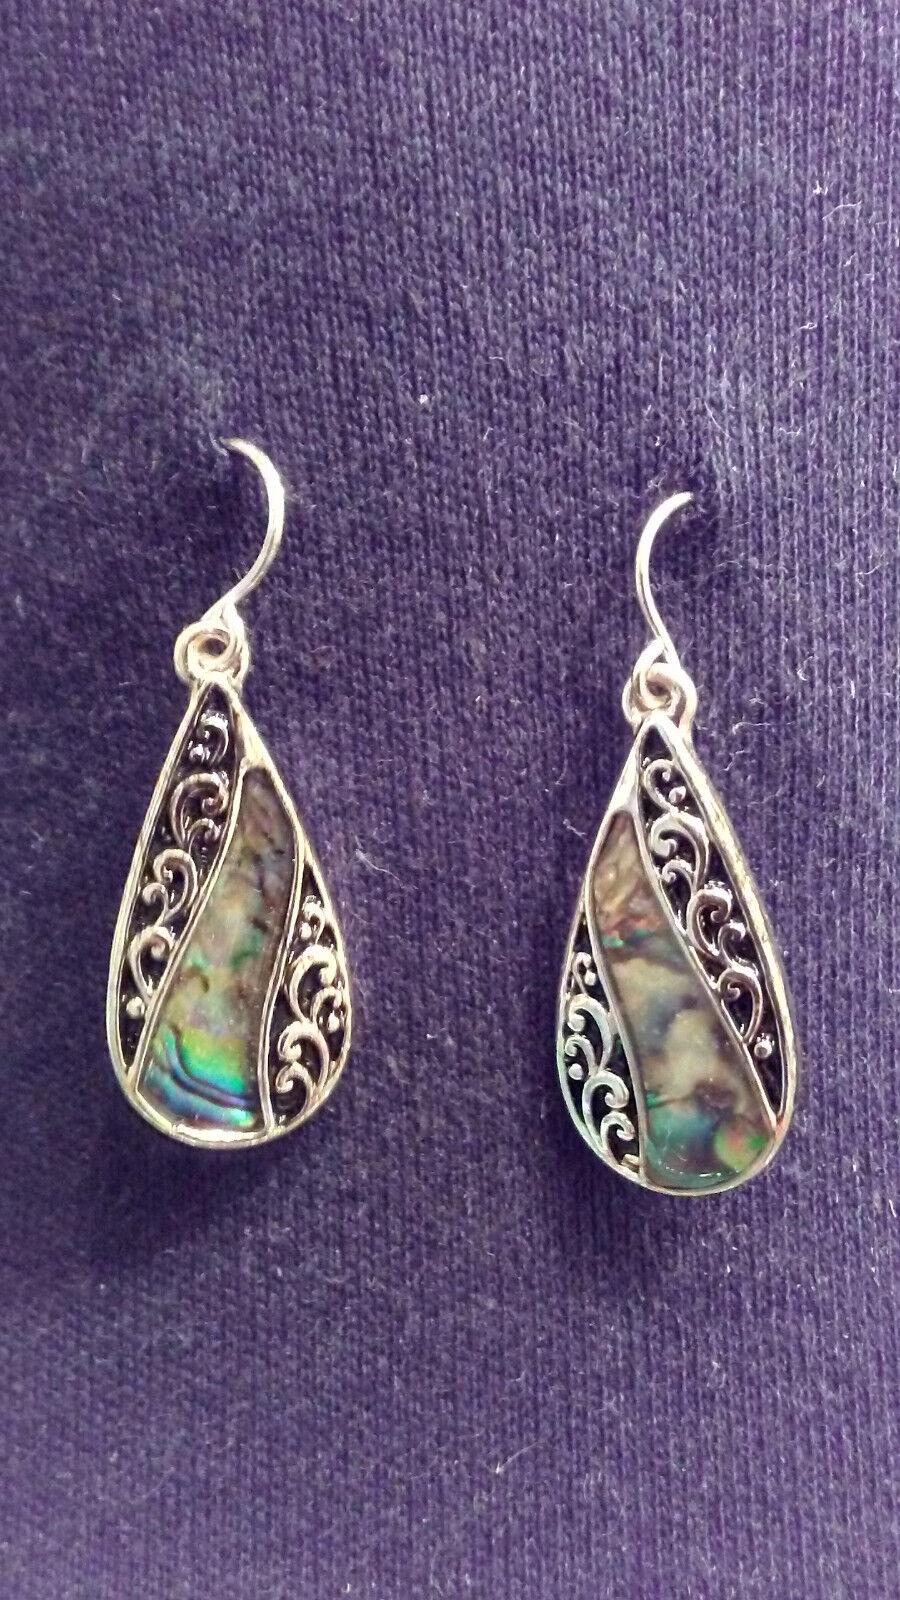 NEW Hallmark Mother Of Pearl Pendant Beaded Necklace Pierced Earrings Set MOM  - $20.99